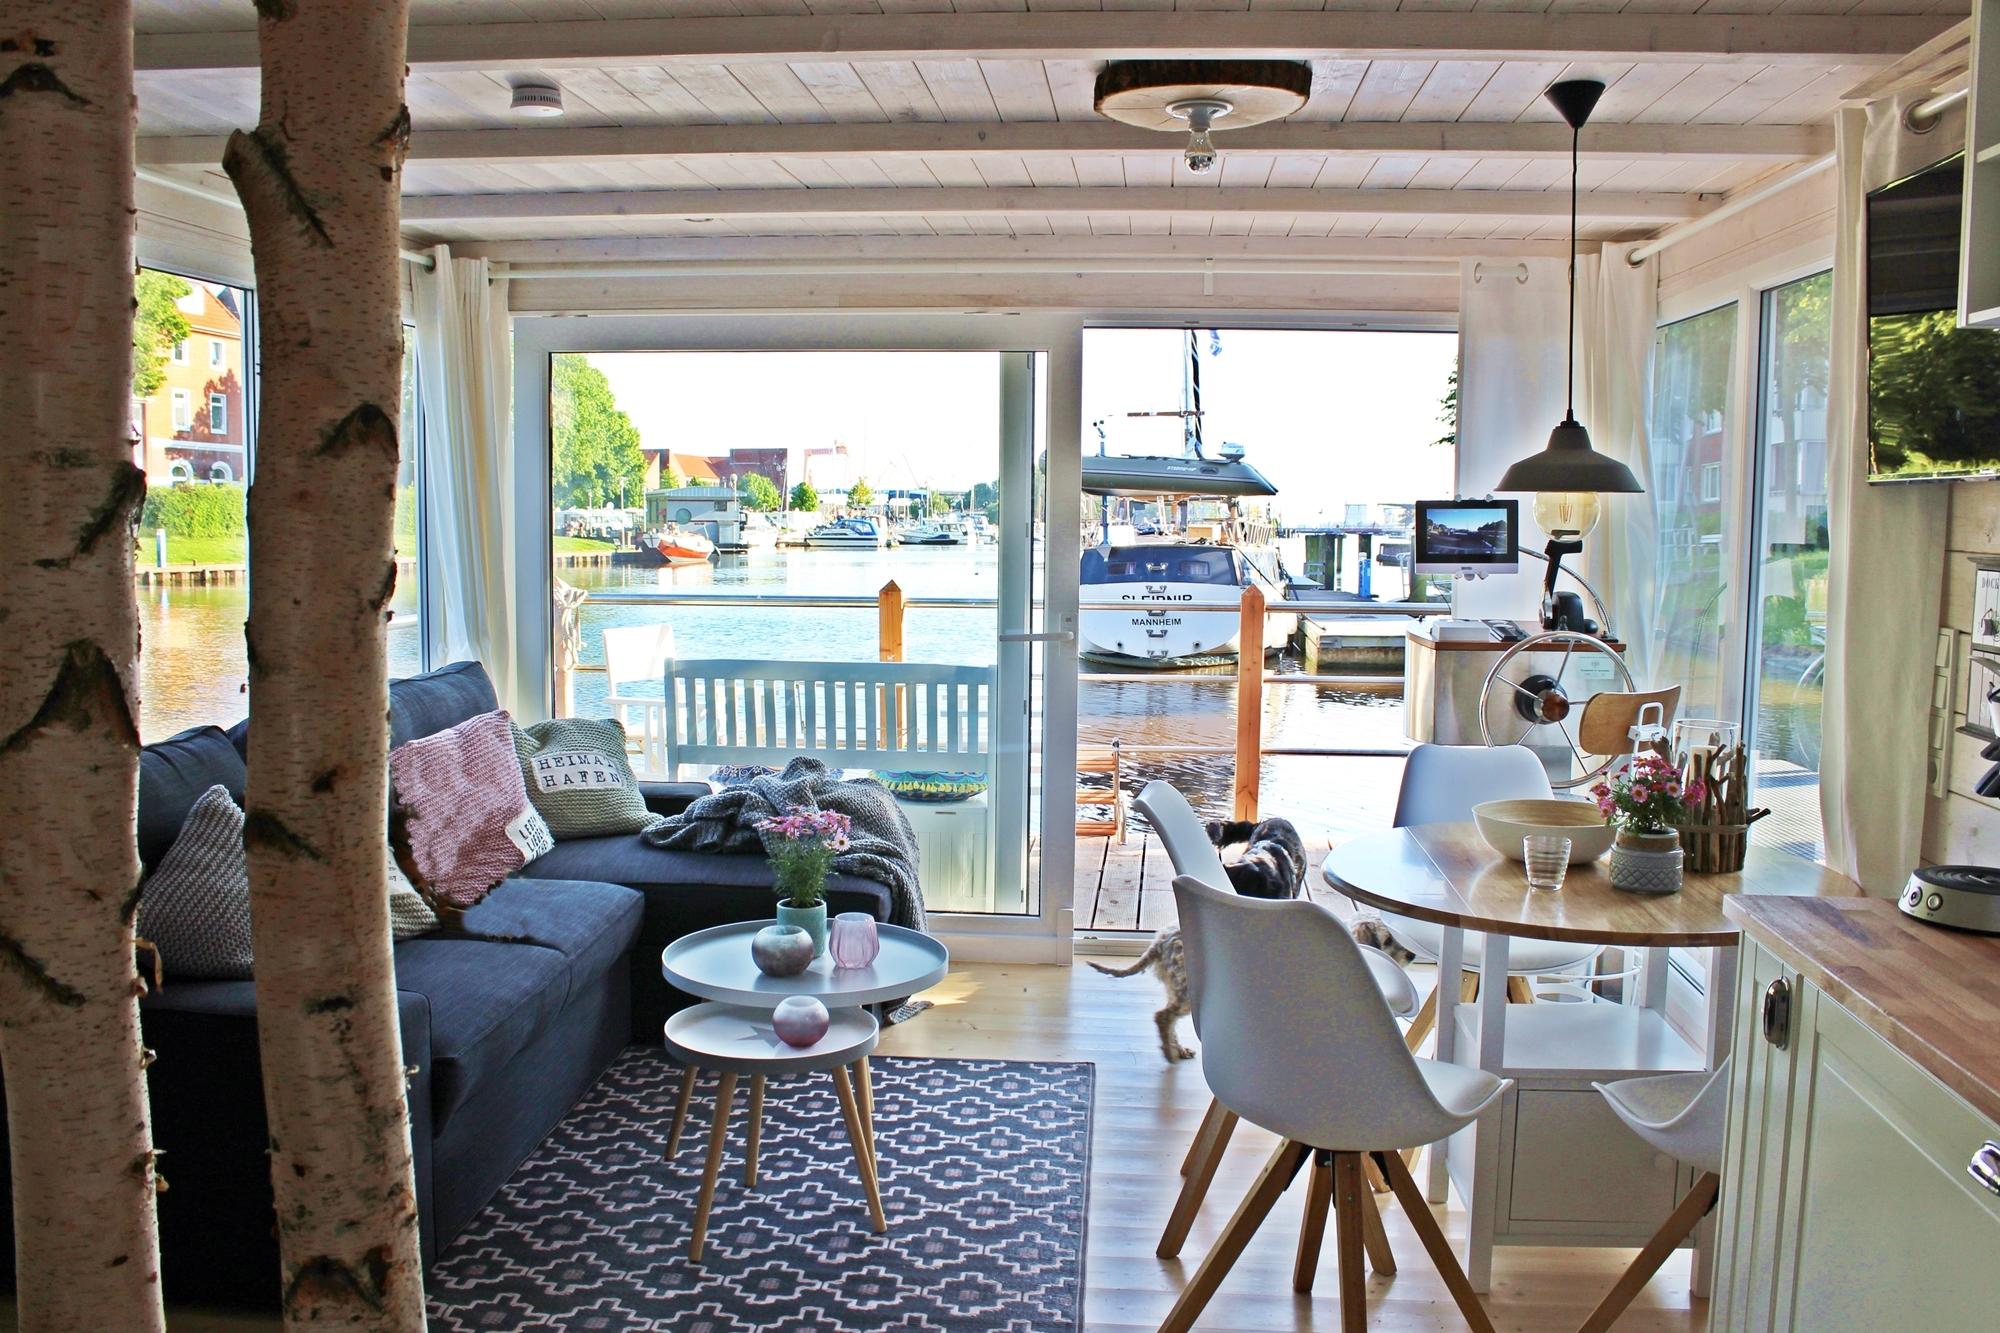 preise hausboot urlaub m nsterland. Black Bedroom Furniture Sets. Home Design Ideas